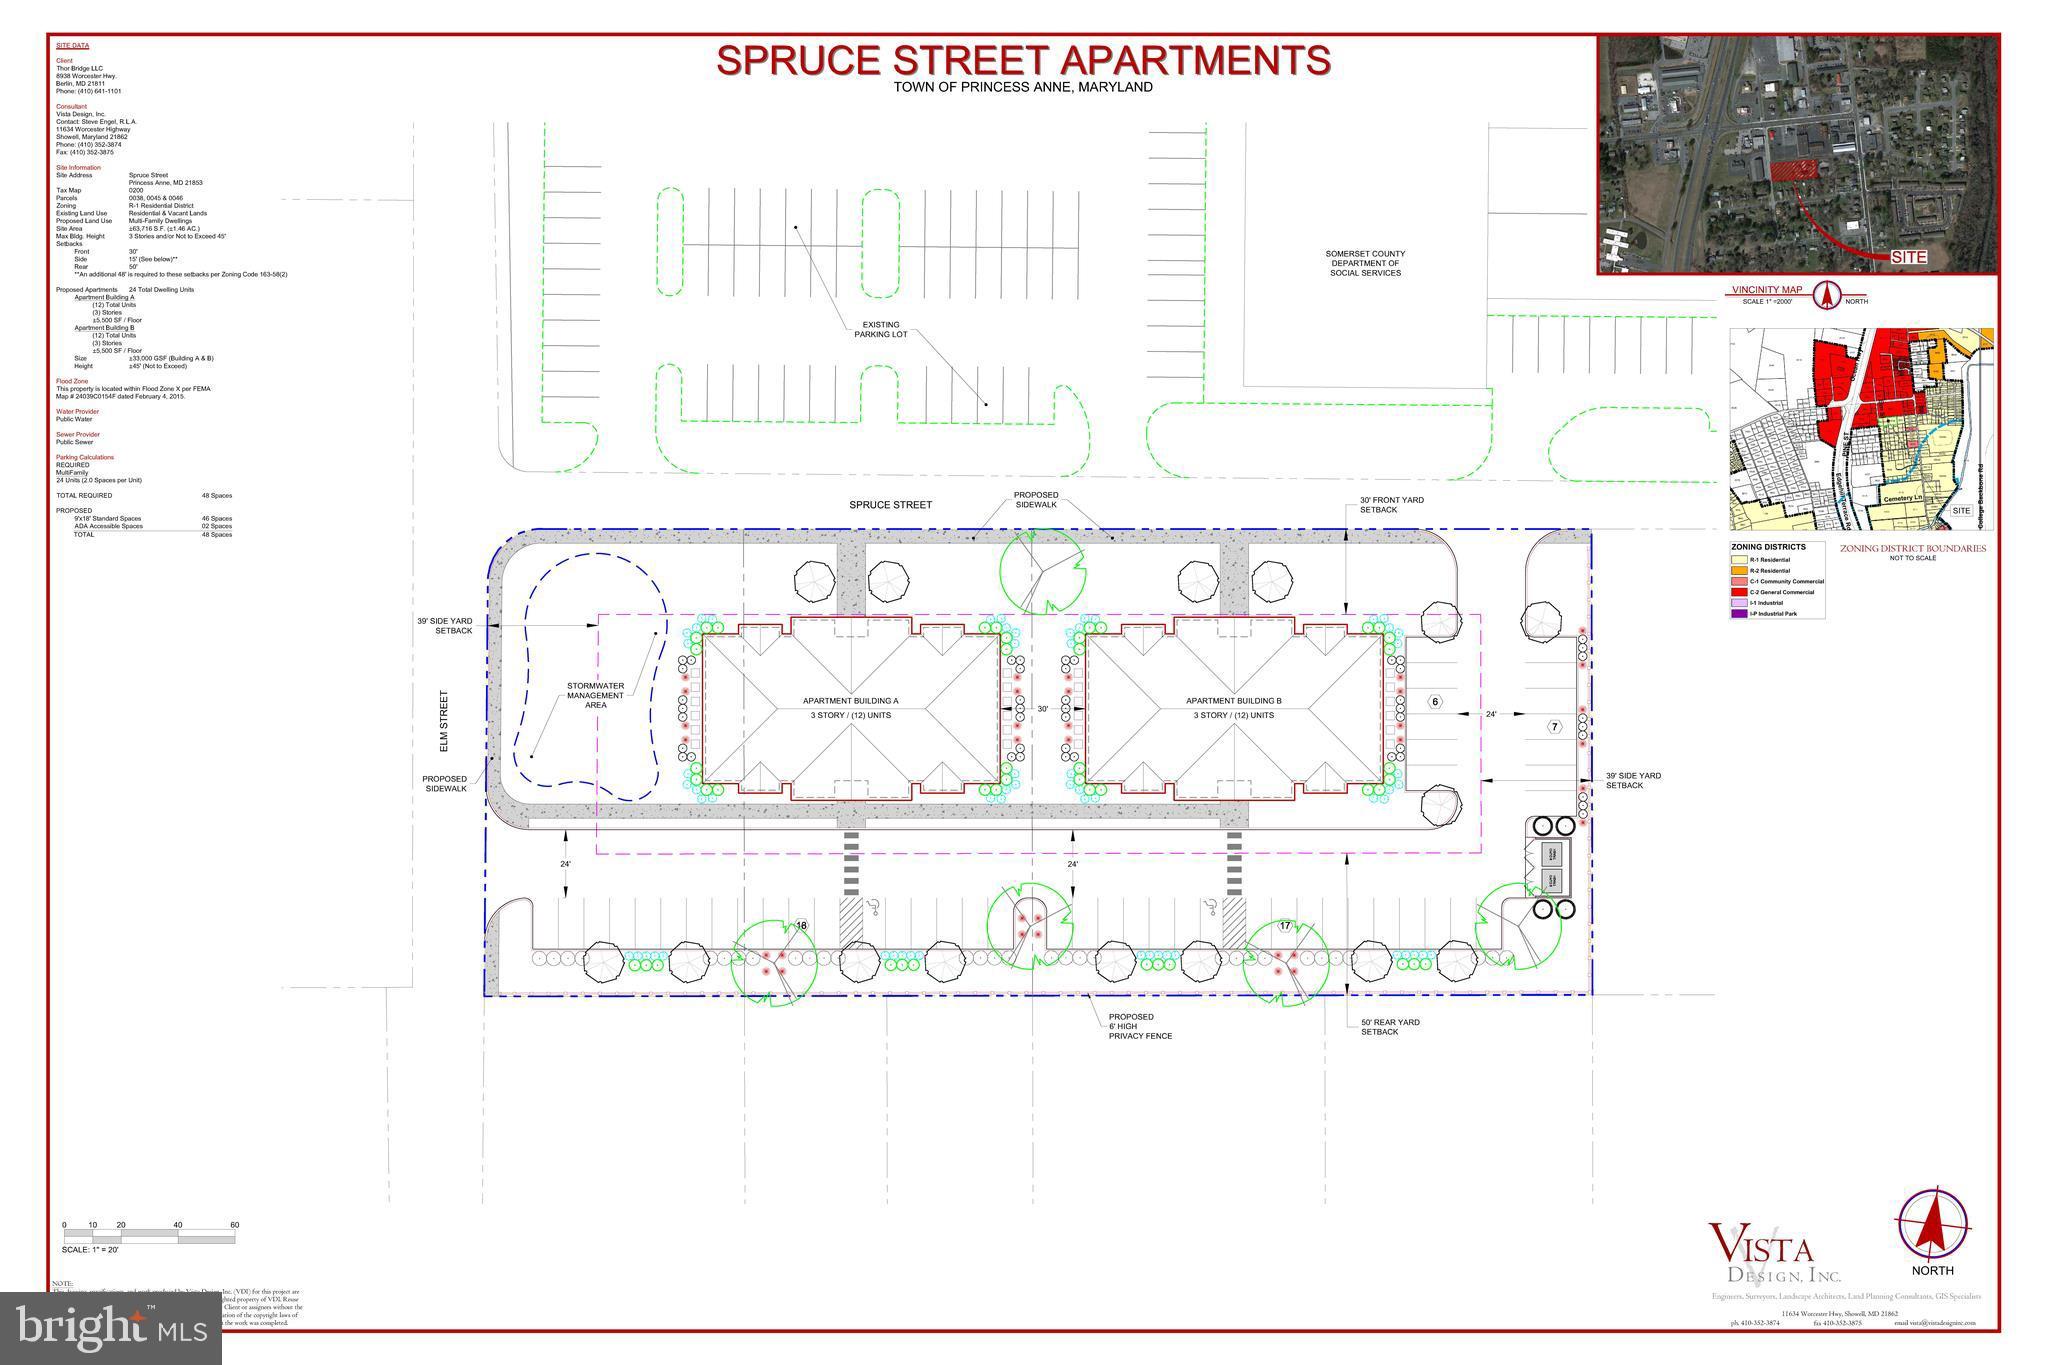 30409 SPRUCE STREET, PRINCESS ANNE, MD 21853